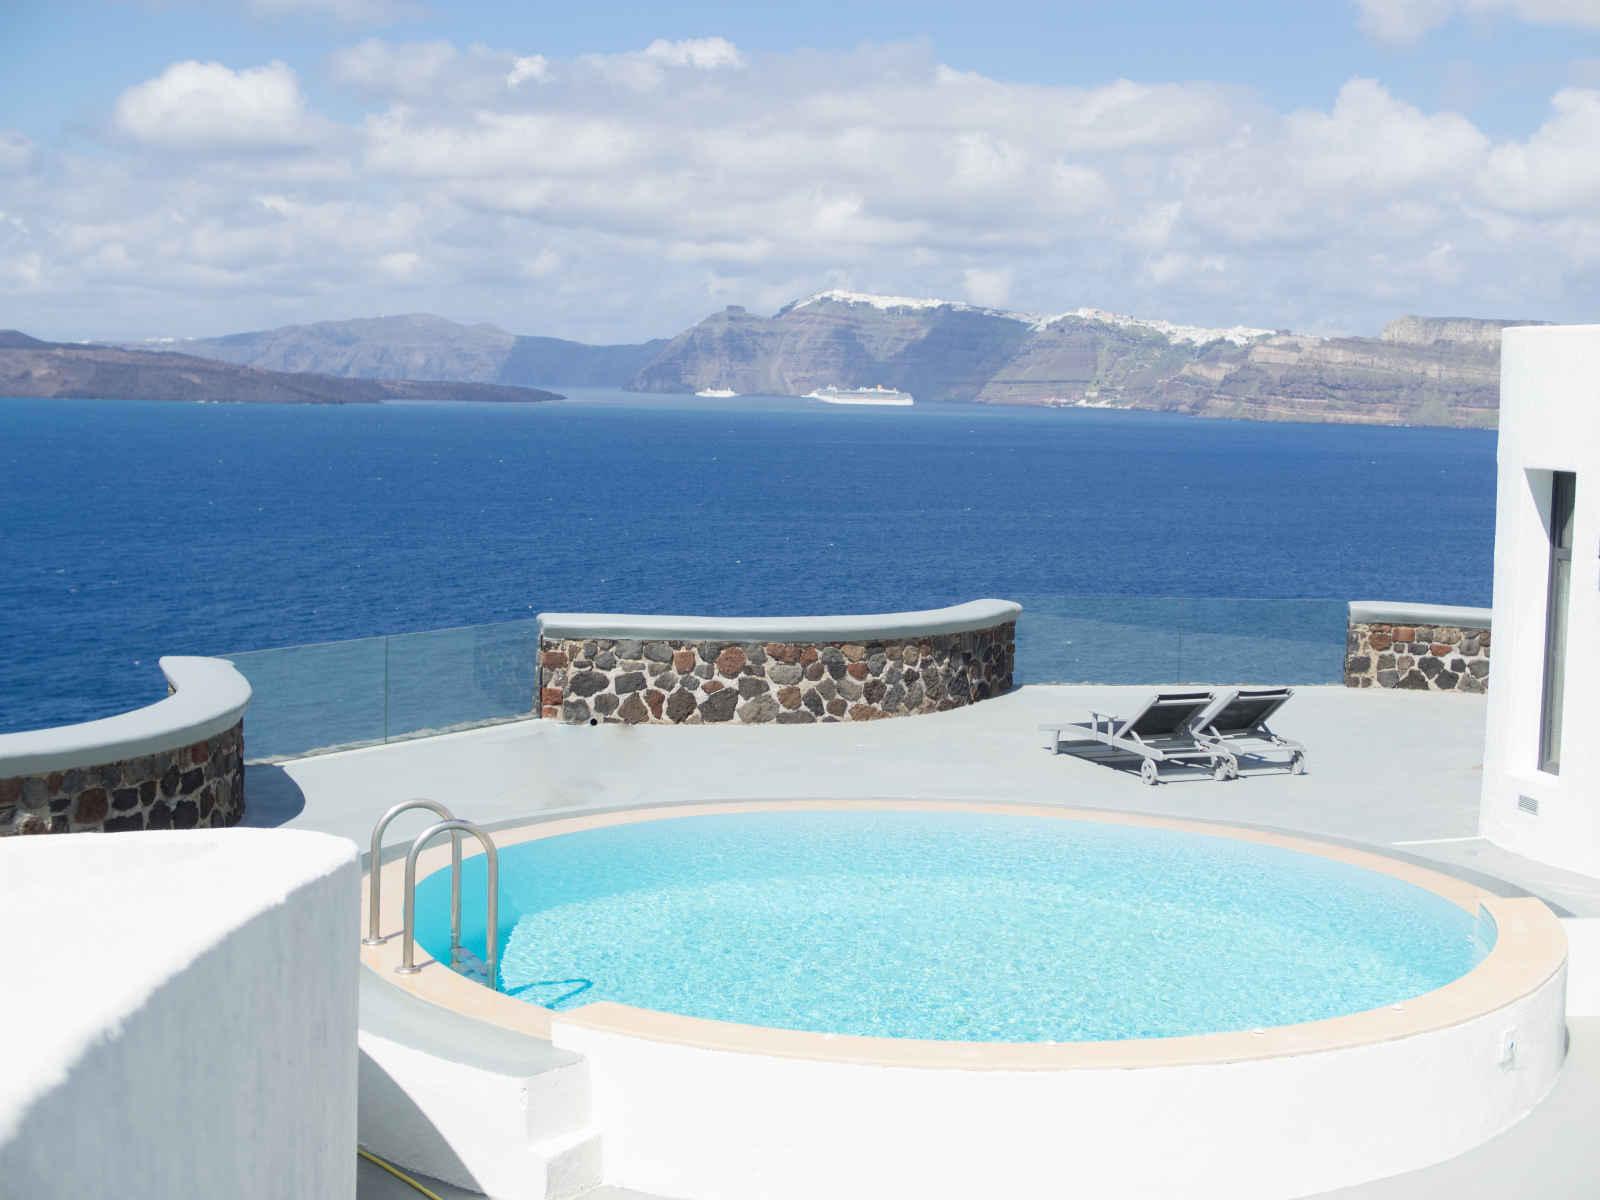 Grèce : Ambassador Aegean Luxury Hotel & Suites